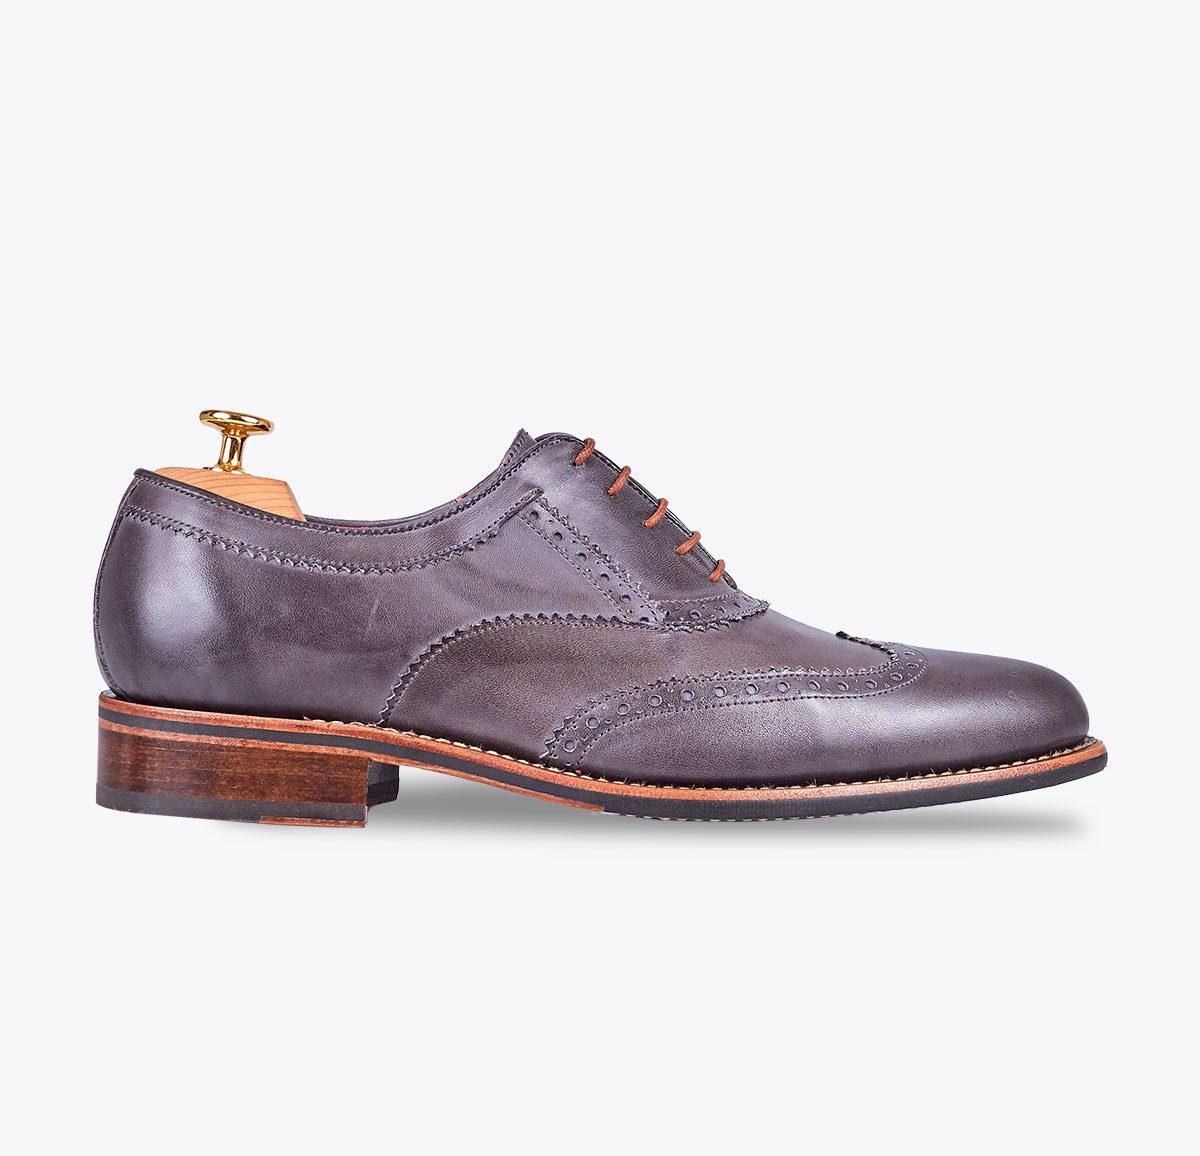 Zapato Sidney hecho a mano en mandalashoes, Santanyí Mallorca. Hand made shoes. Nach Mass Schuhe